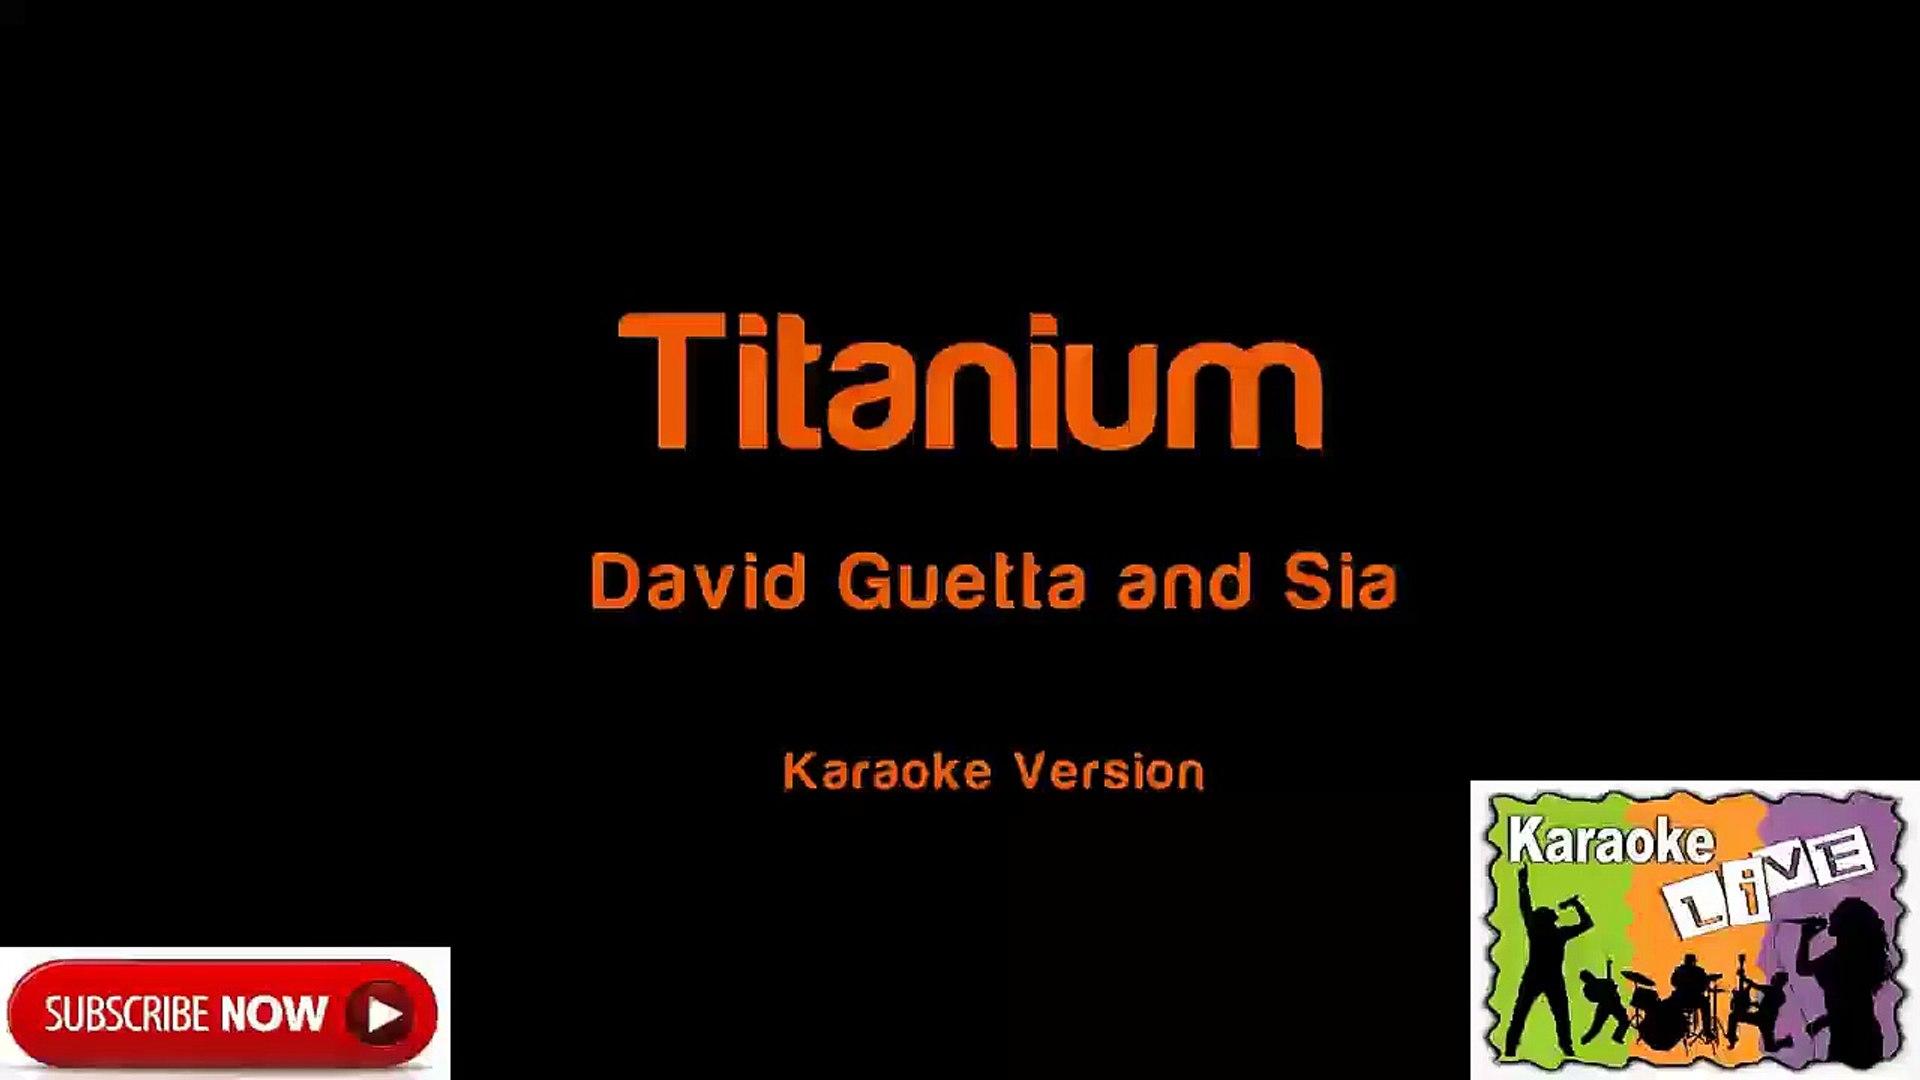 David Guetta and Sia Titanium Karaoke Version Best songs Of David Guetta